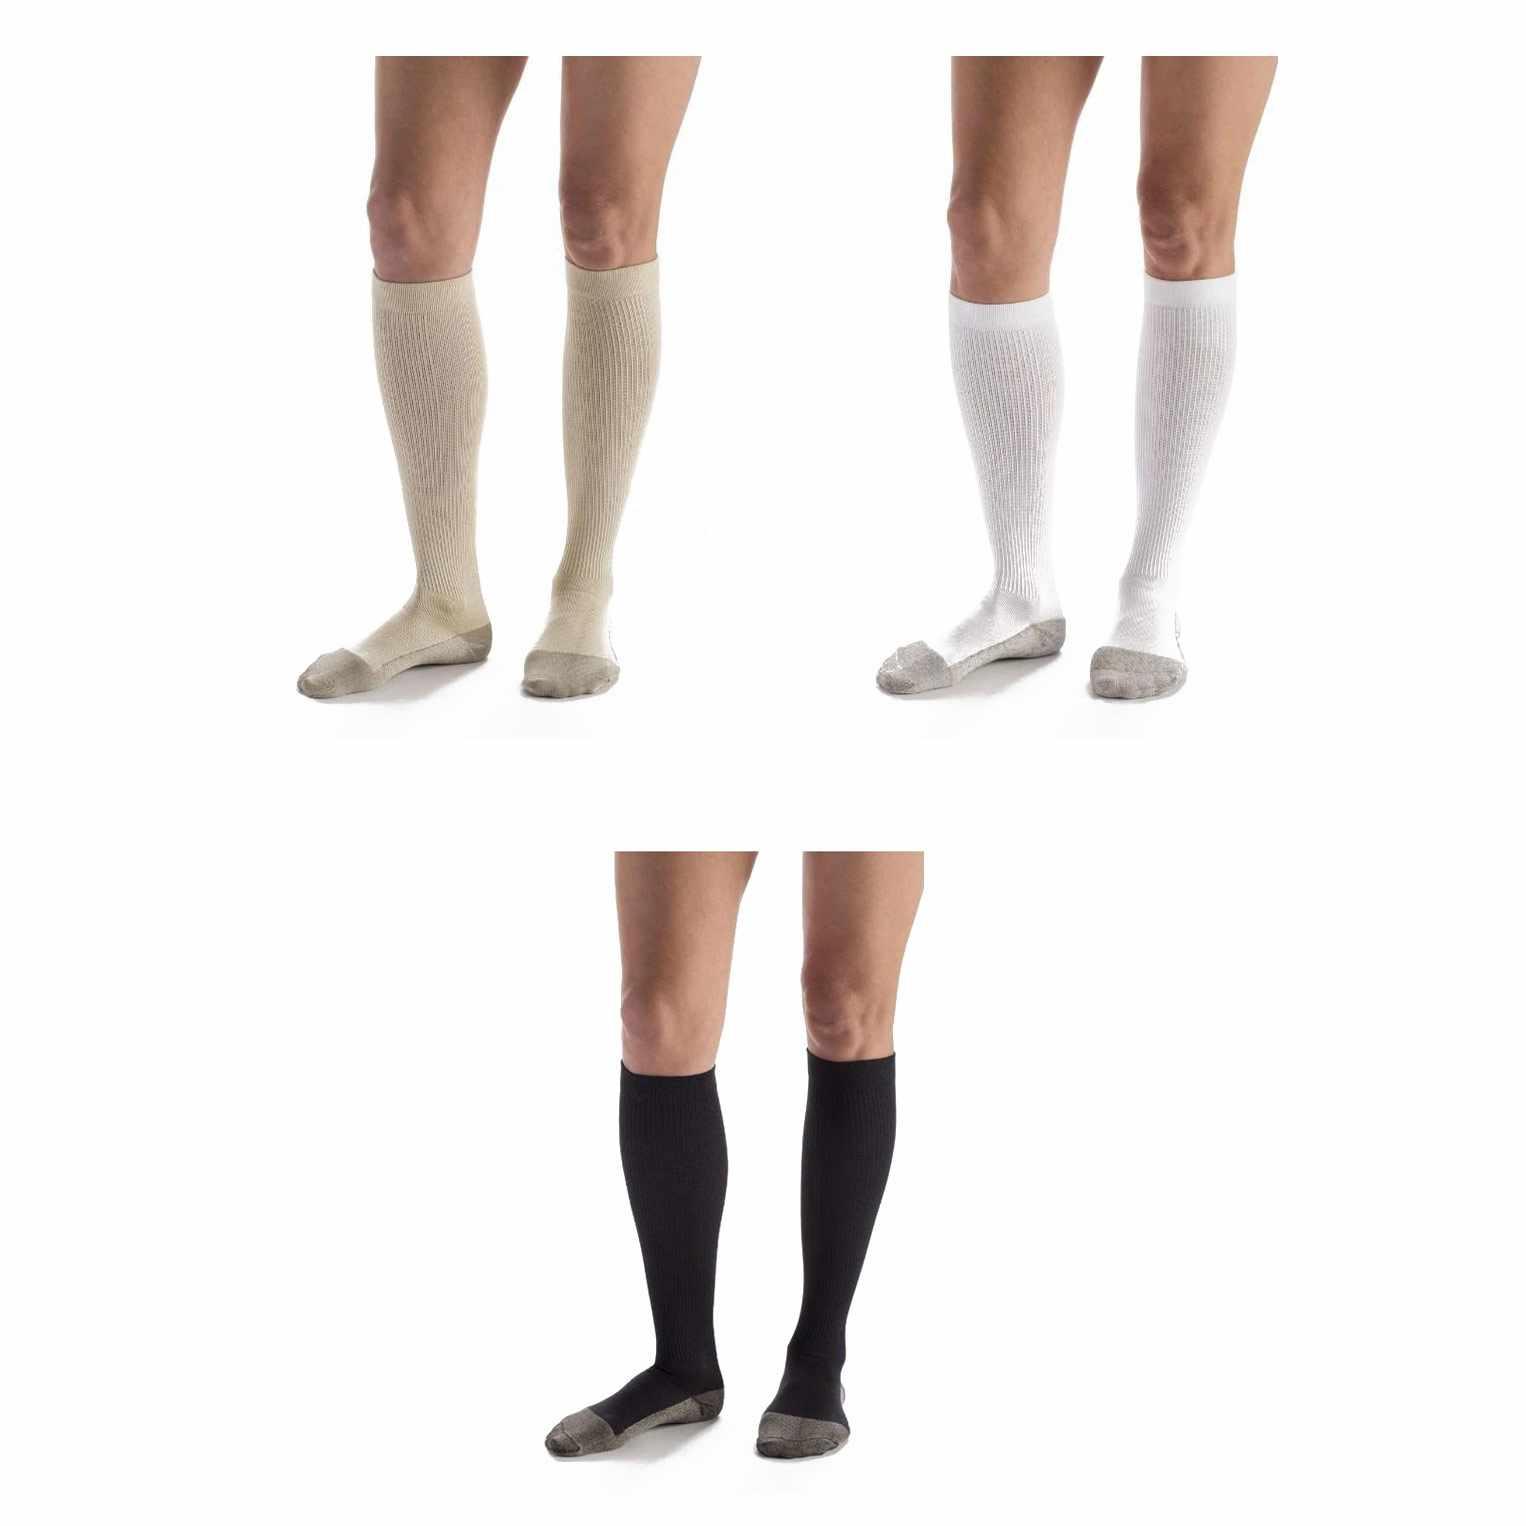 Carolon Cushion Foot Socks with Anti-Microbial Silver